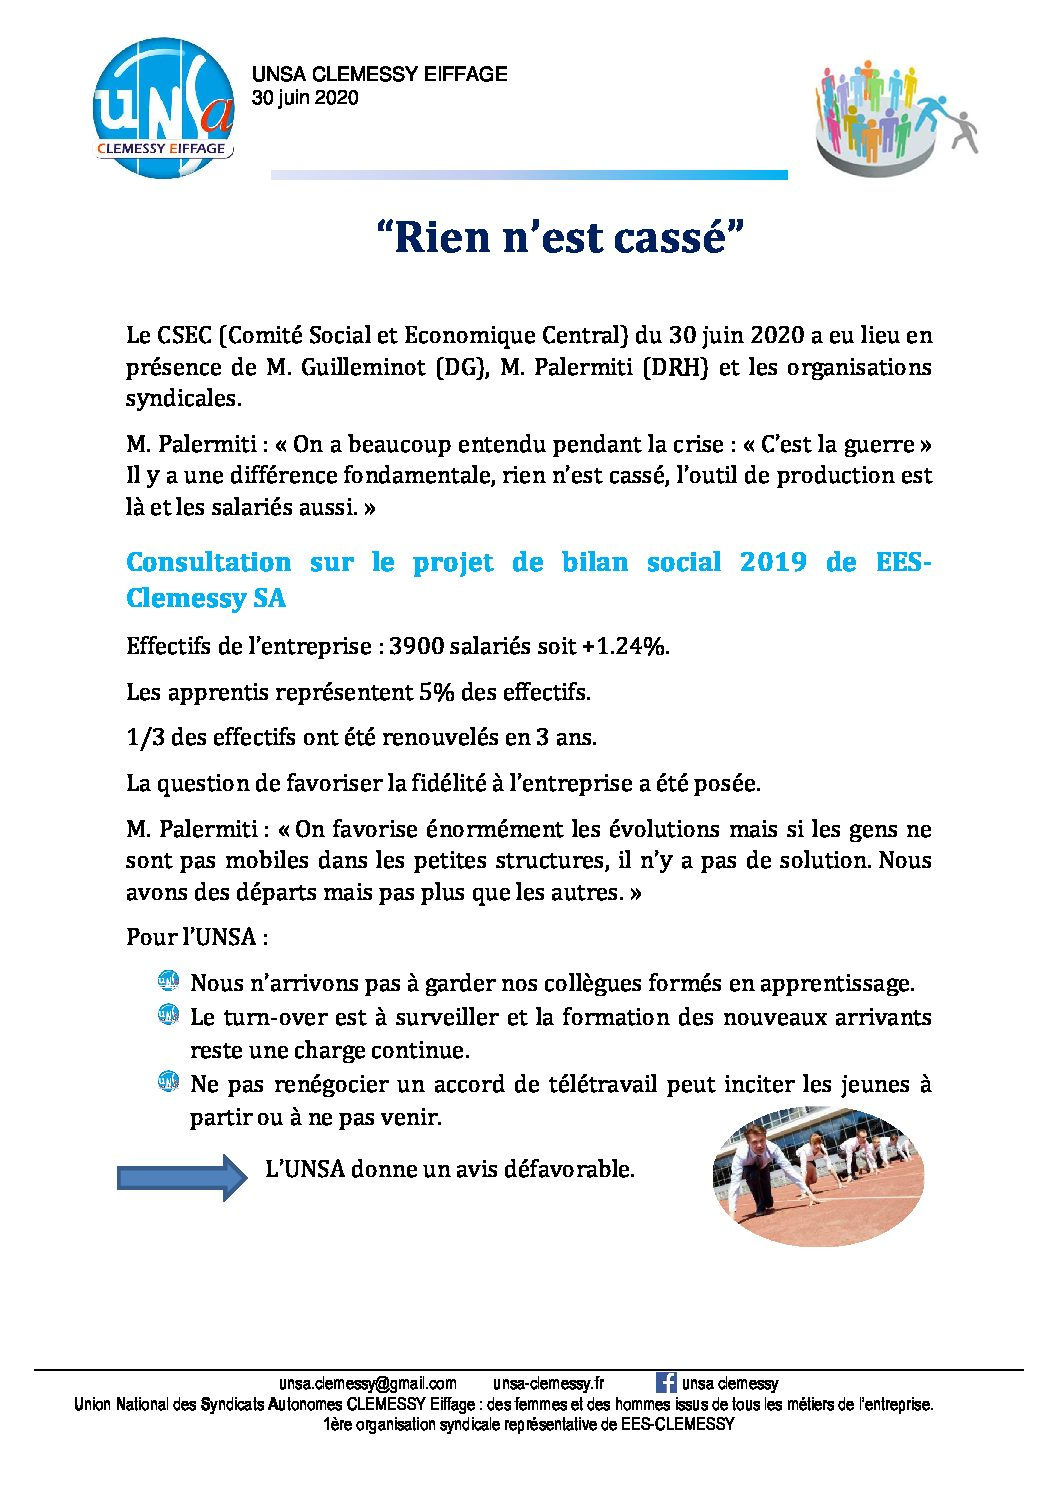 2020-06-30-CSEC-UNSA-Clemessy-Eiffage